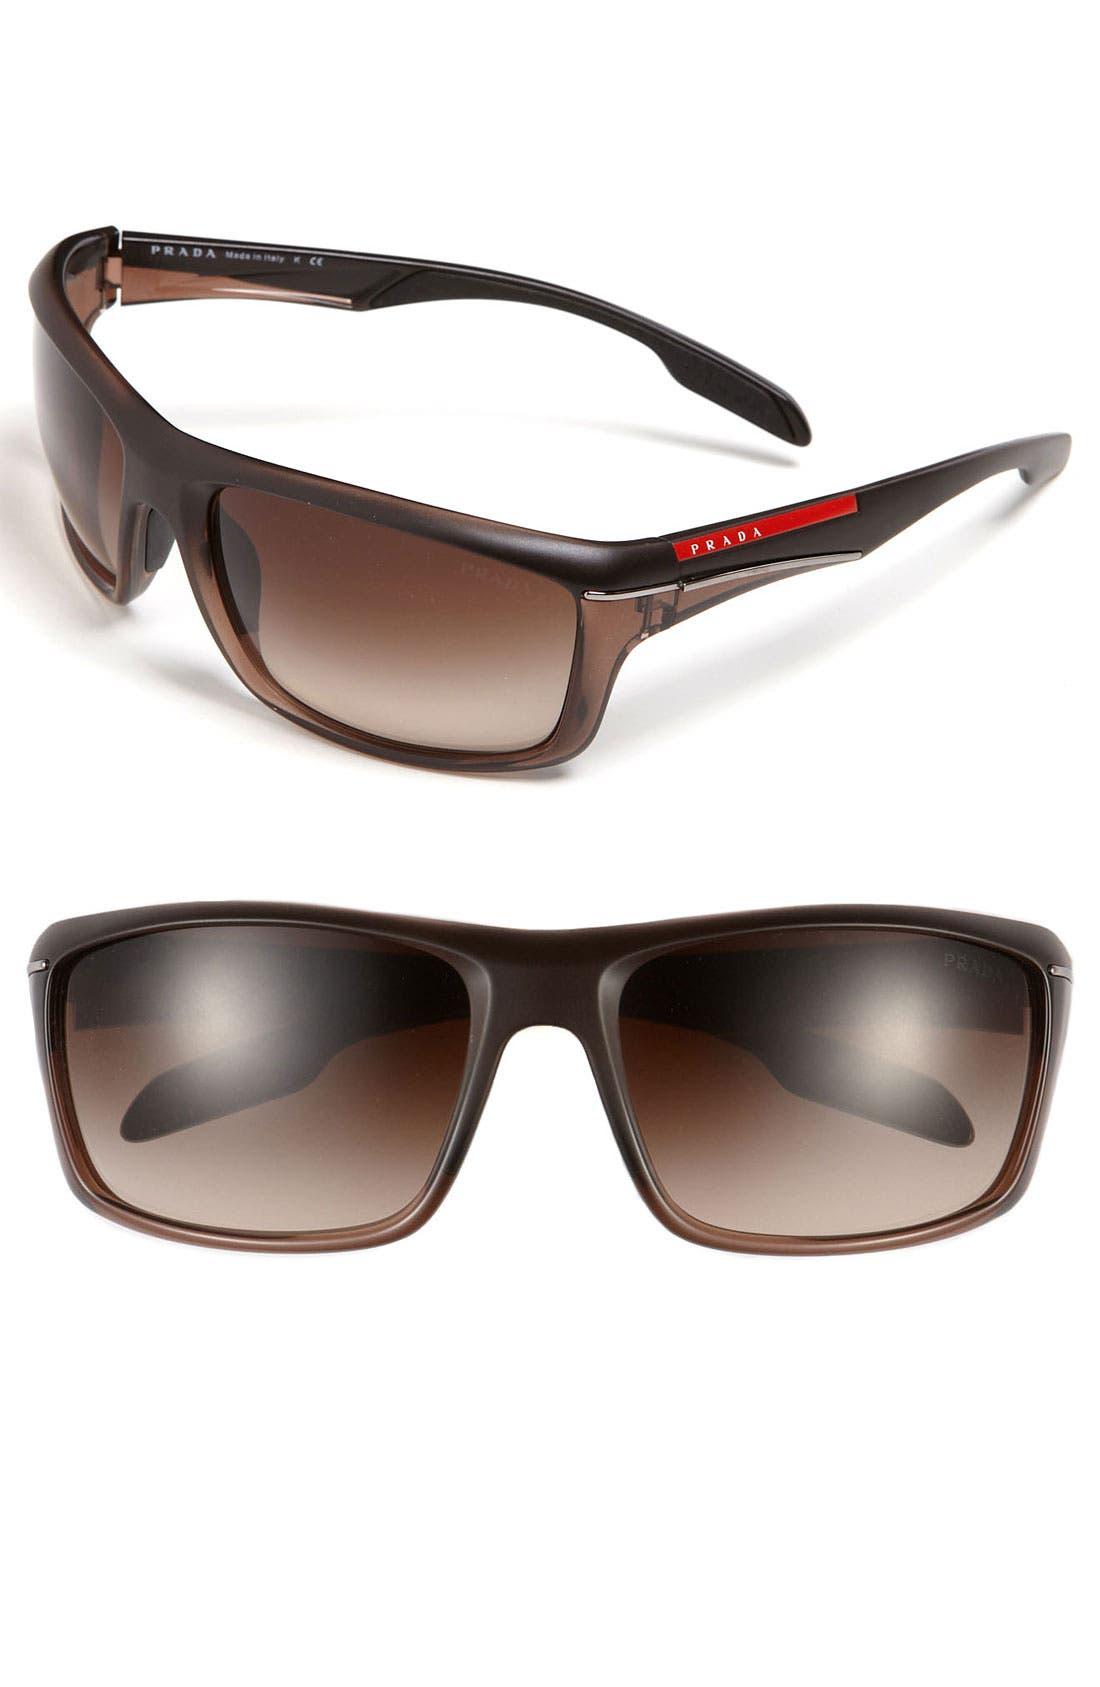 Main Image - Prada 'Sport Wrap' 63mm Rectangular Sunglasses